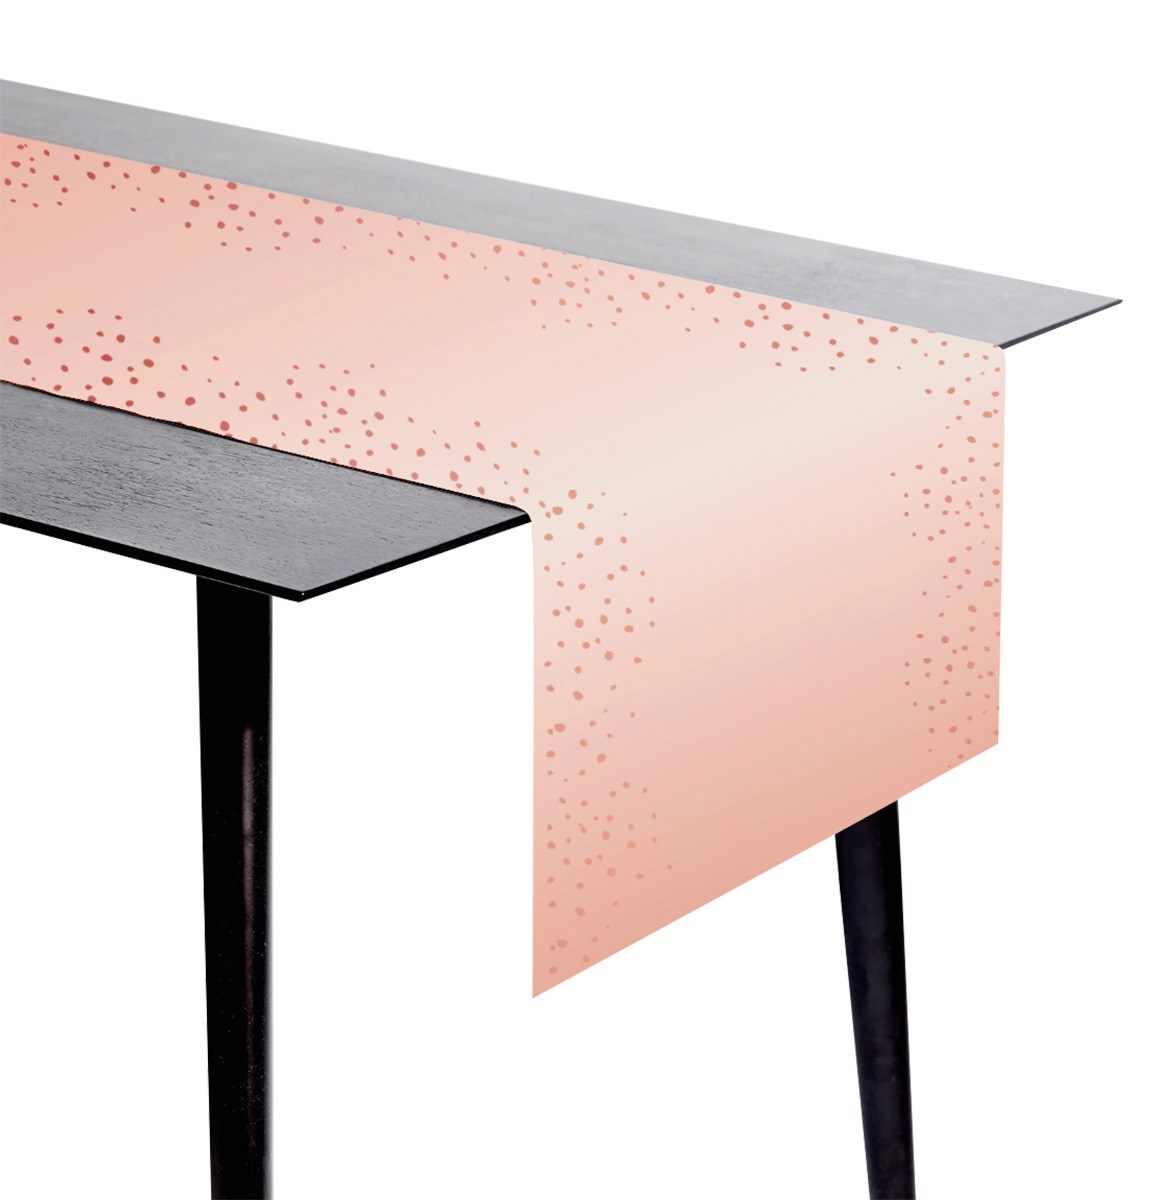 Table runner Elegant Lush Blush 1